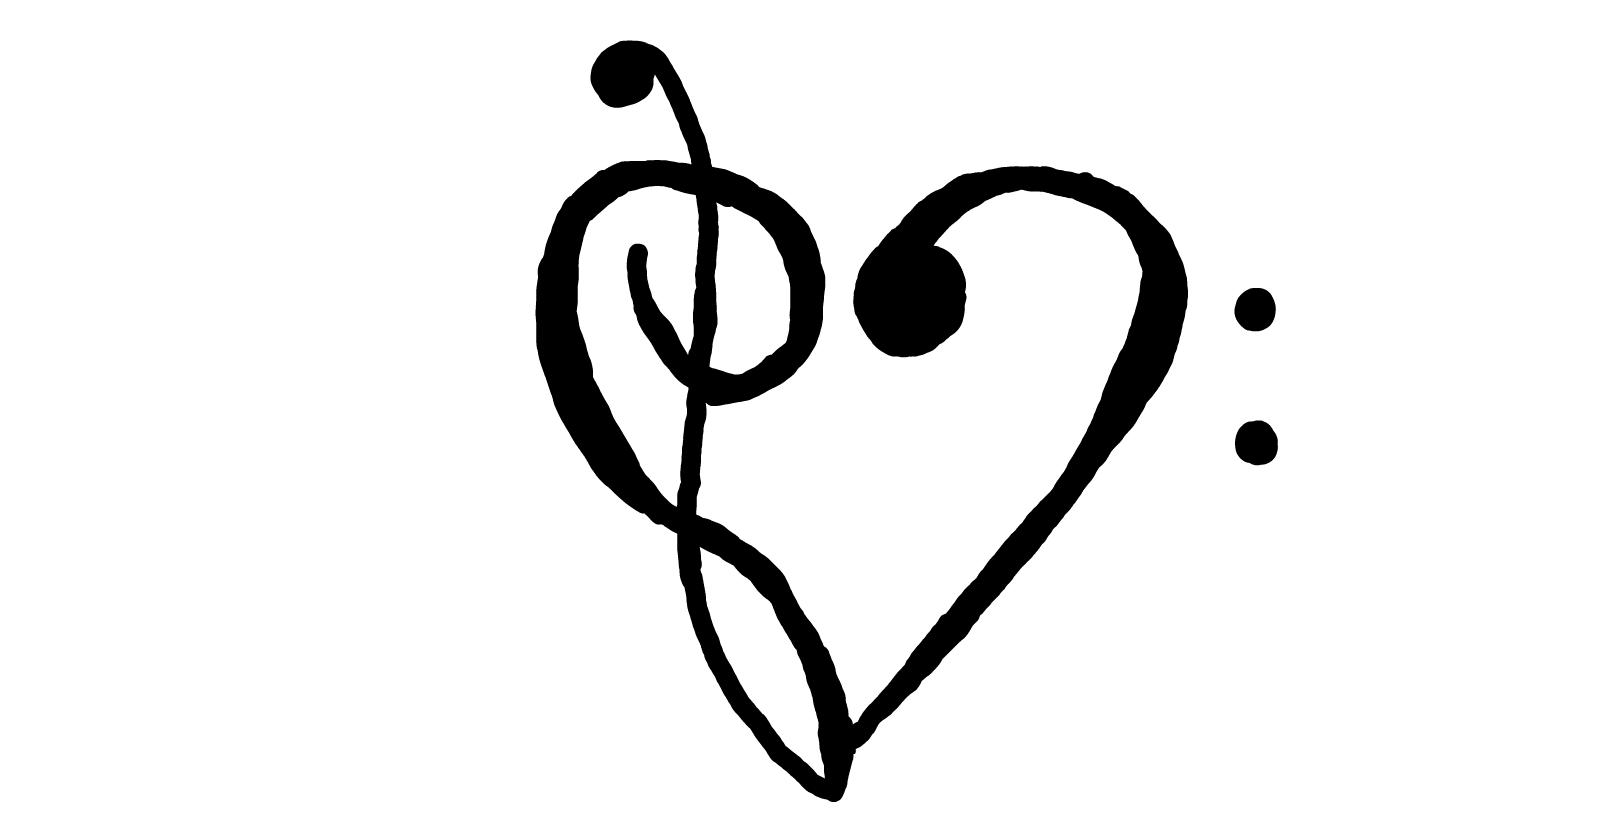 8hUnrWZyQHFaTLKd Eo bgtf4loOu174iA8VLJu7gwuZi8 I8JdI RV1ixxfc7qKD KBimTYBMrVxjs  ConDYMJjg=s0 - My Heart For You - Short Story (SW)